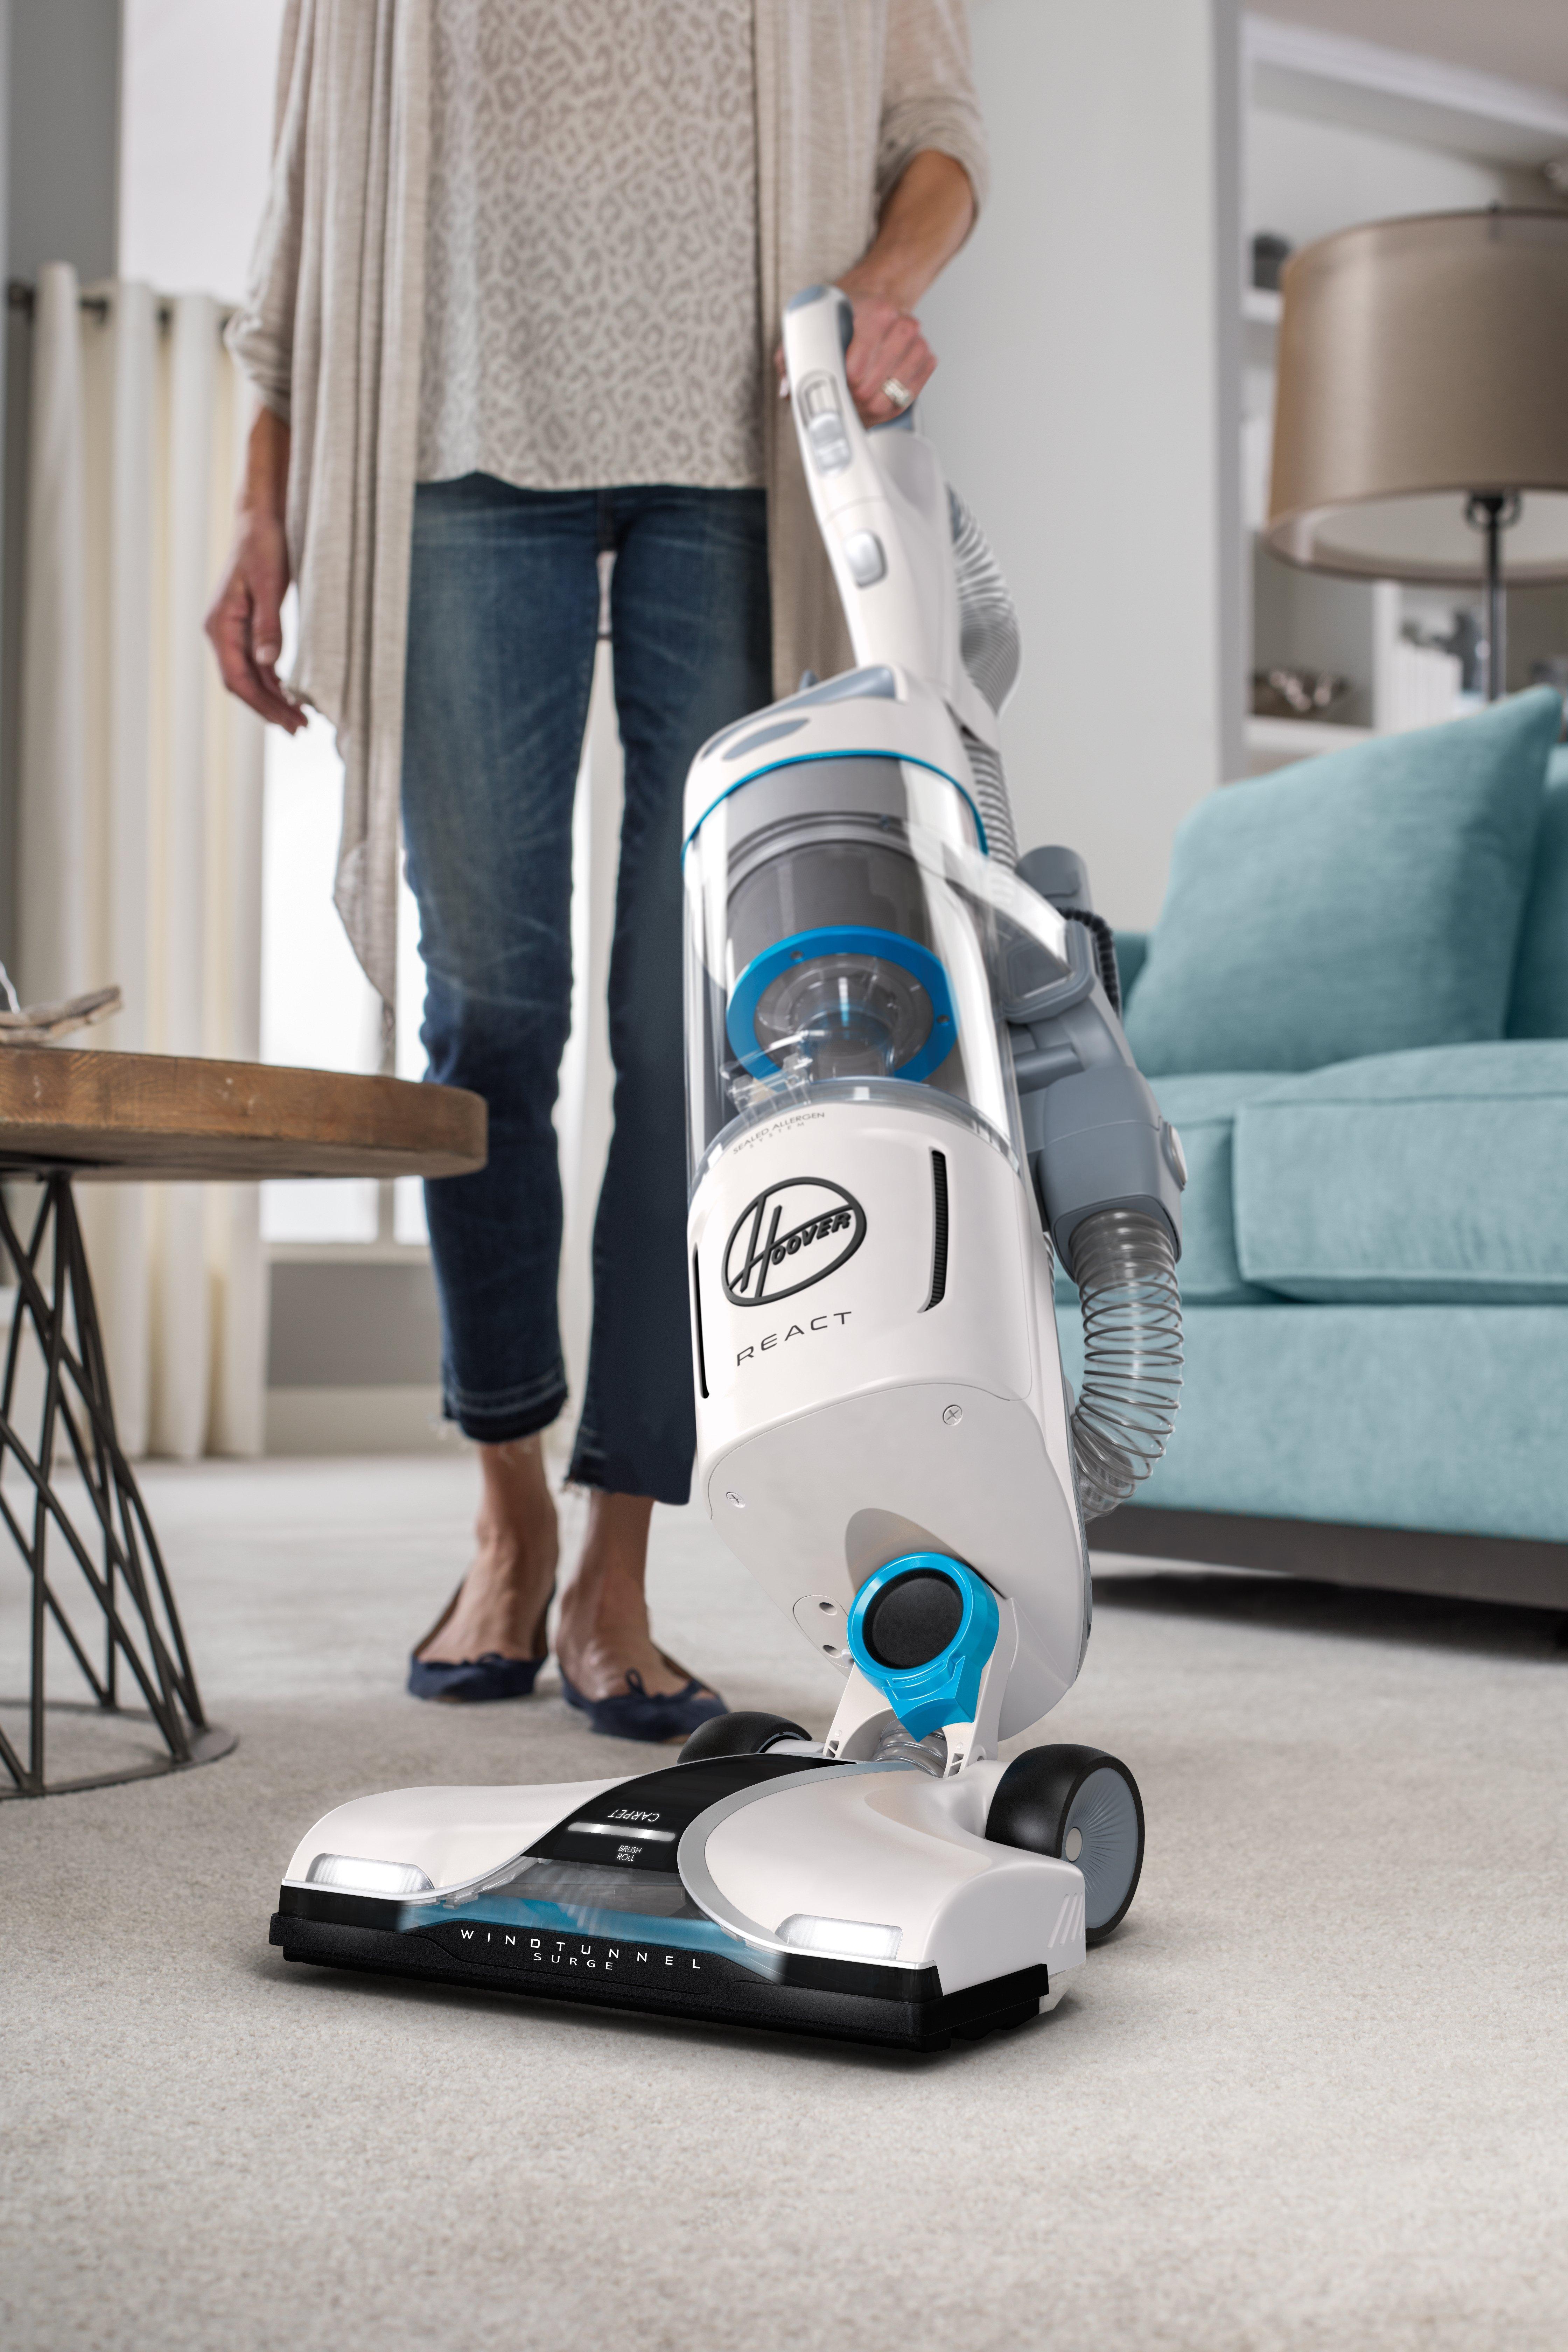 REACT Upright Vacuum41